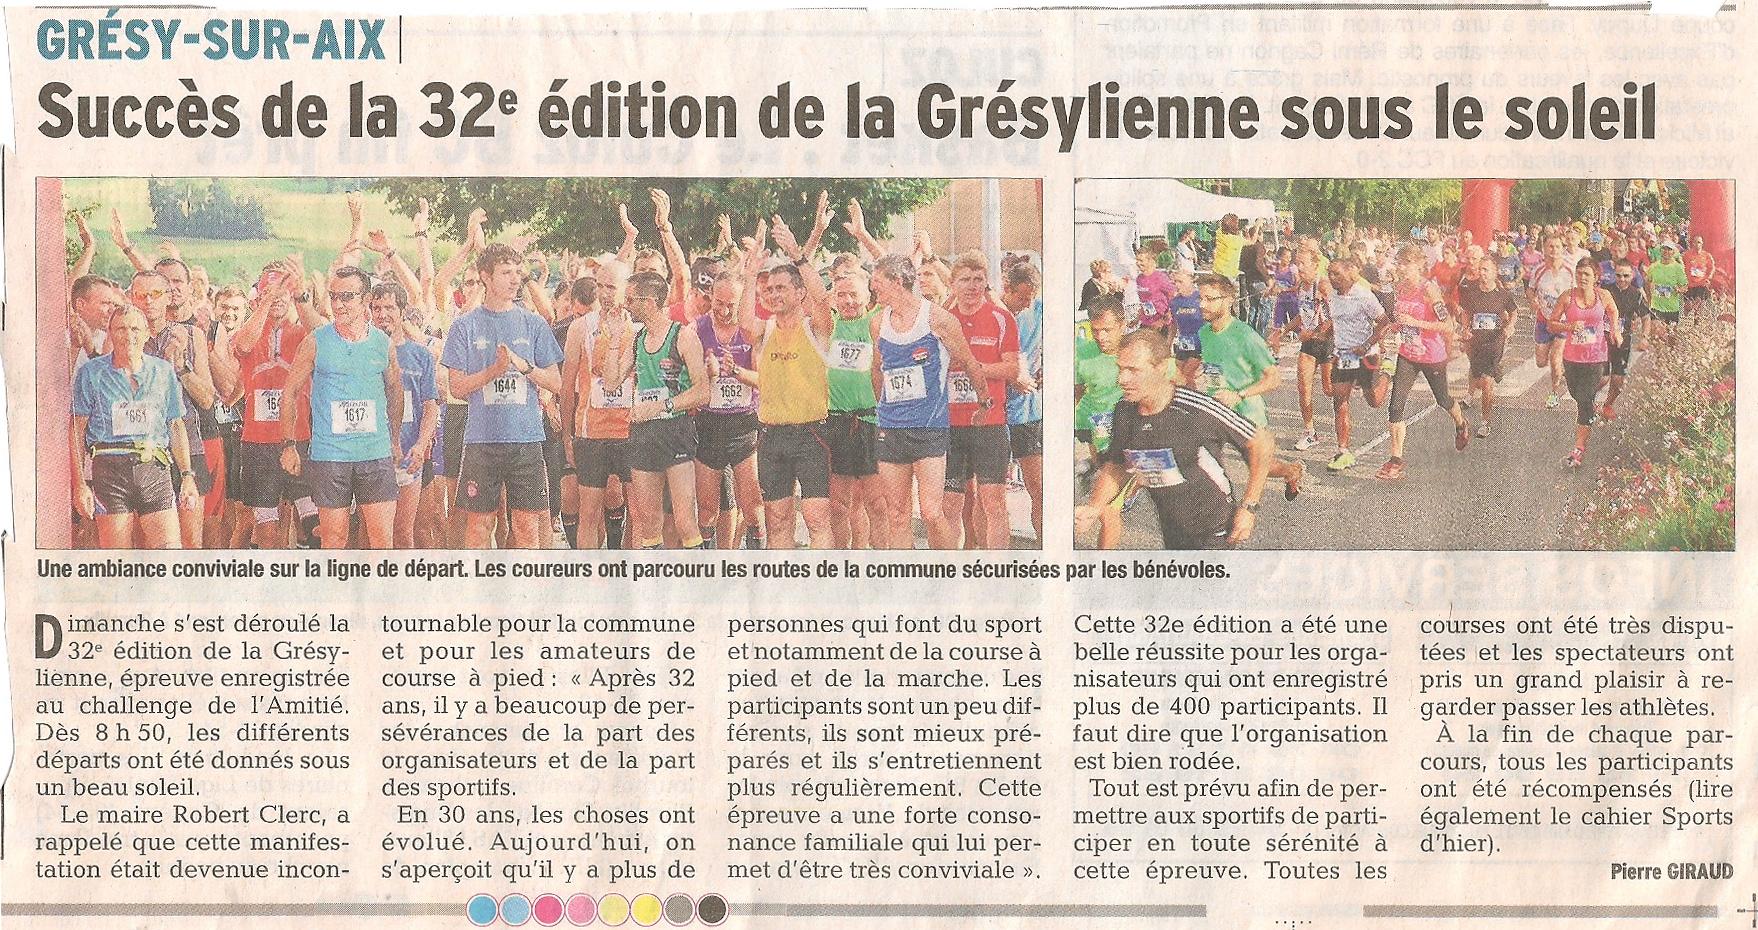 Gresylienne2014_article2